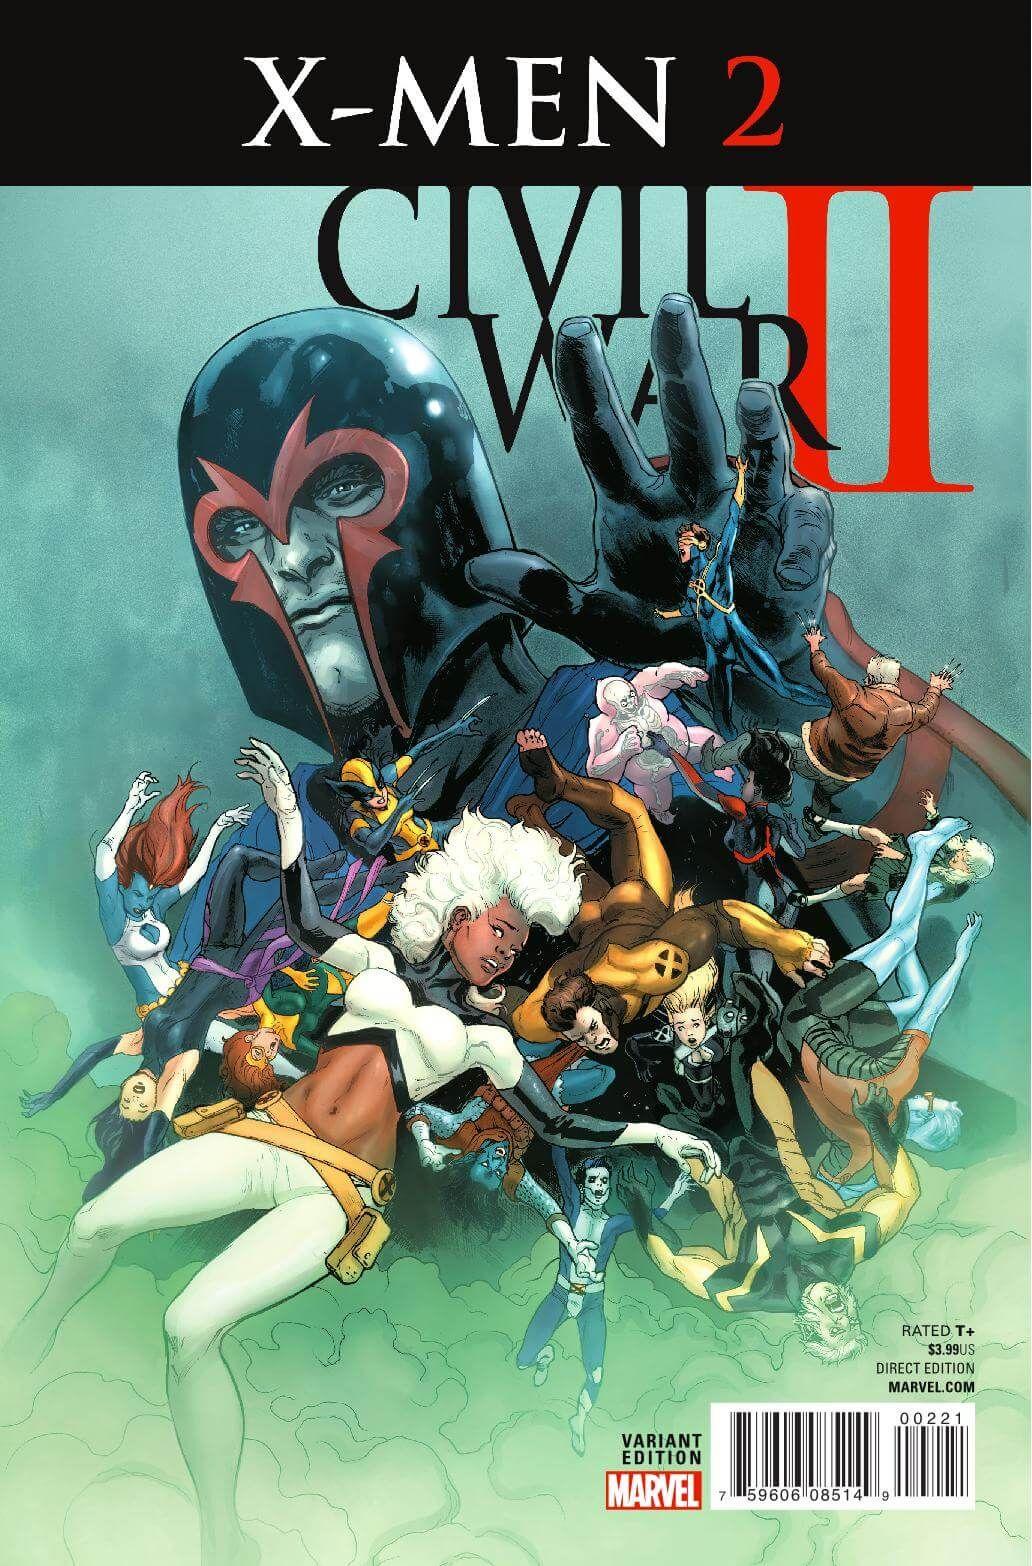 Preview: Civil War II: X-Men #2, Story: Cullen Bunn Art: Andrea Broccardo Cover: David Yardin Publisher: Marvel Publication Date: July 6th, 2016 Price: $3.99 An Inhu..., #All-Comic #All-ComicPreviews #AndreaBroccardo #CIVILWARII:X-MEN #Comics #CullenBunn #DavidYardin #Marvel #previews